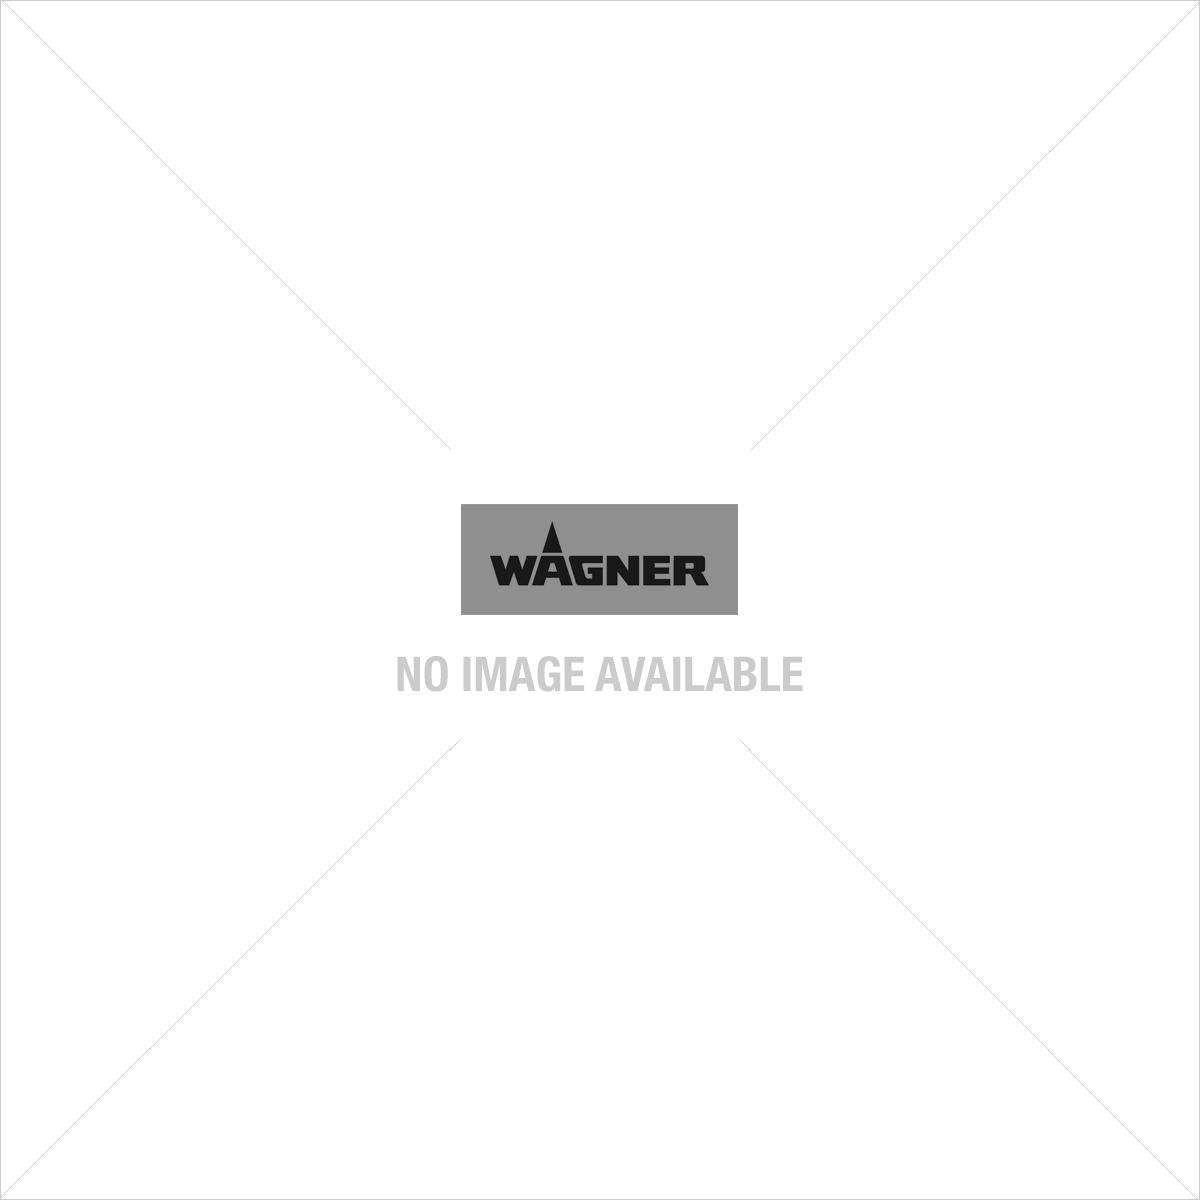 Wagner PowerPainter 60 pistolet à peinture Airless